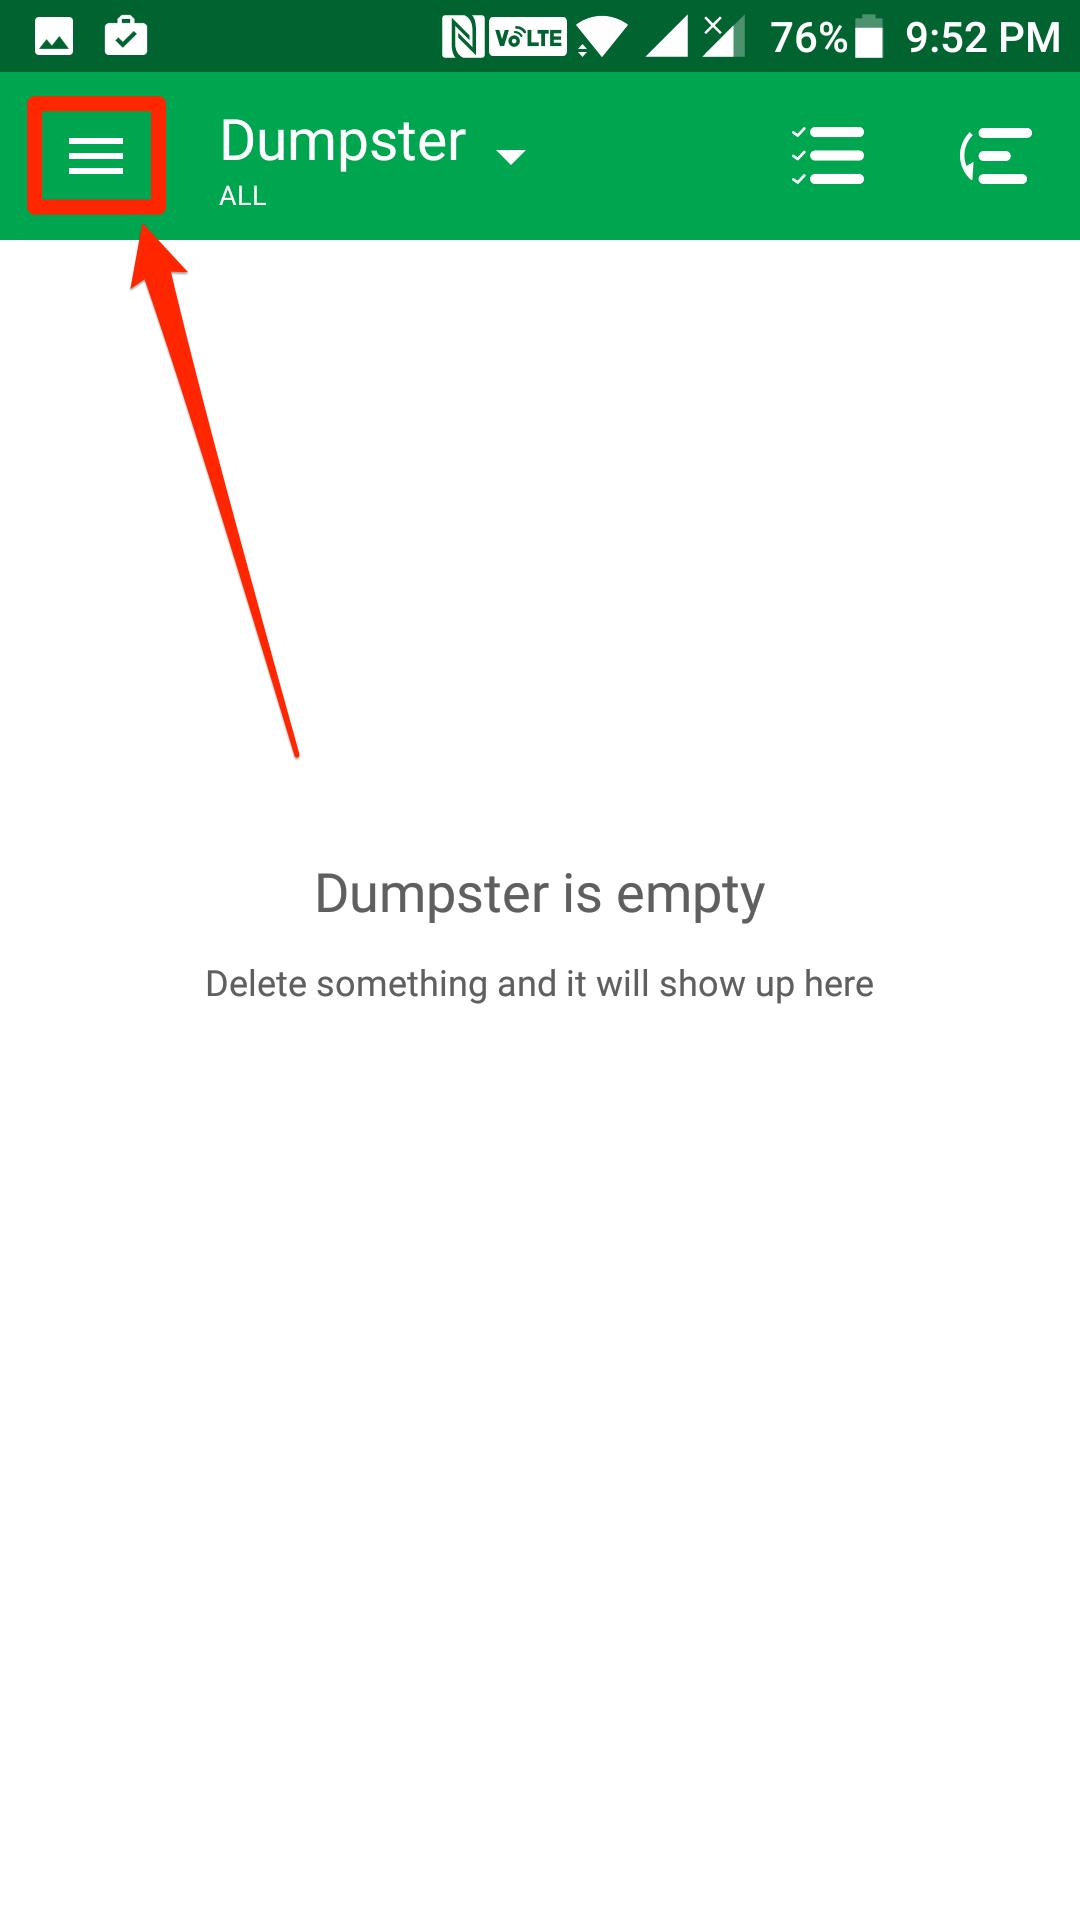 dumpster-hamburger